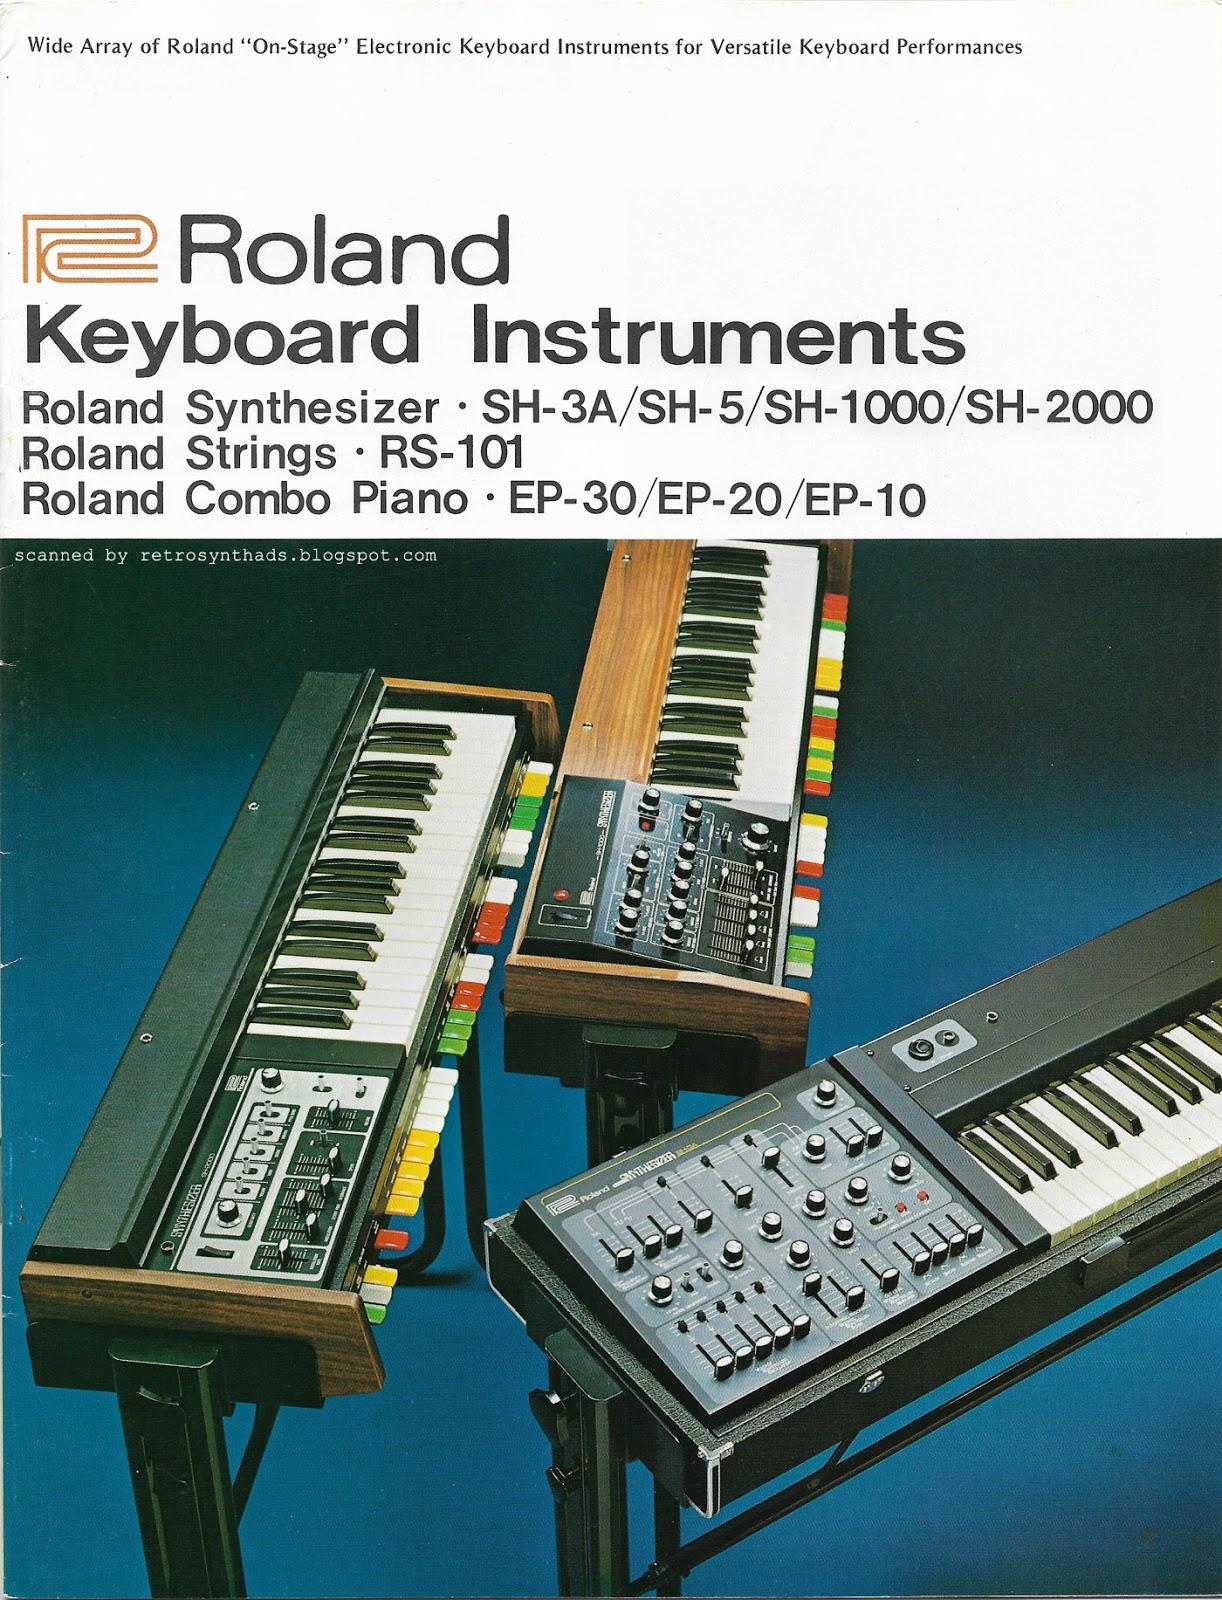 MATRIXSYNTH: 1976 Roland